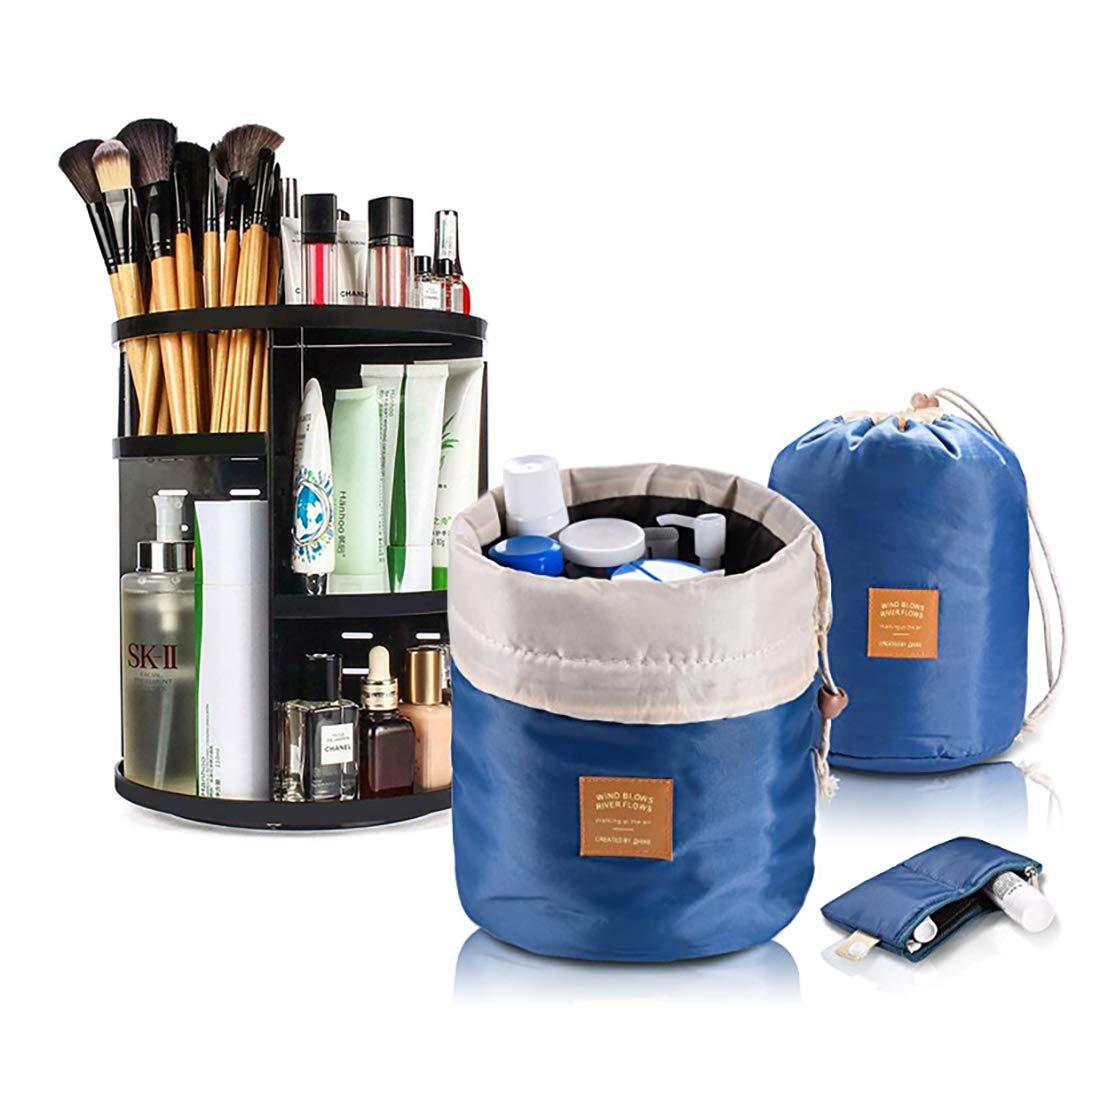 Ahavas Rotating Makeup Organizer, Travel Bag, and Cosmetics Pouch (3 Pc. Set) Large Capacity Storage Rack w/Adjustable Shelves | Classic Bathroom Counter Organization